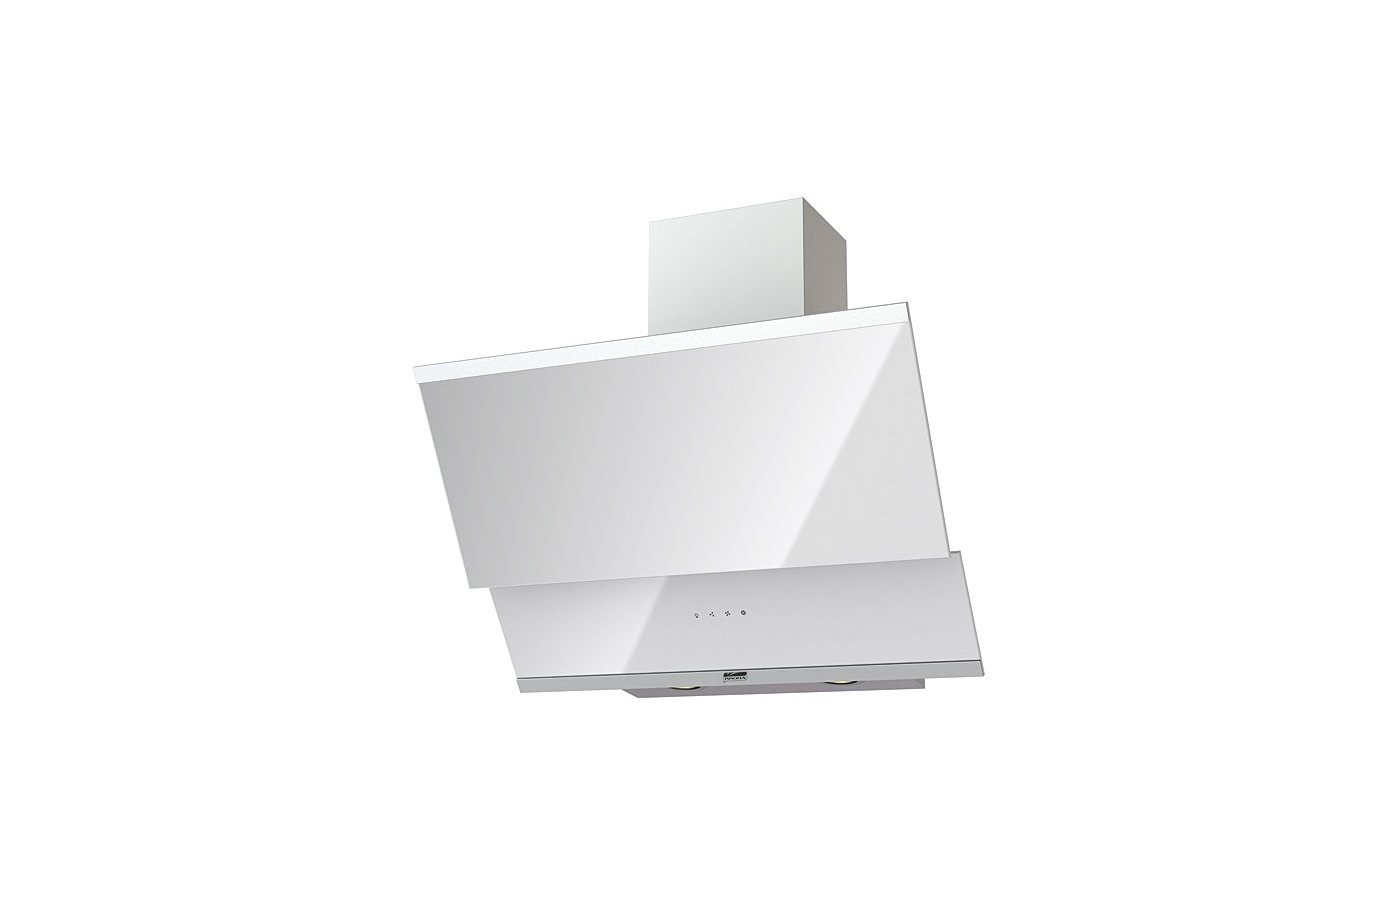 Вытяжка KRONA IRIDA 600 white sensor